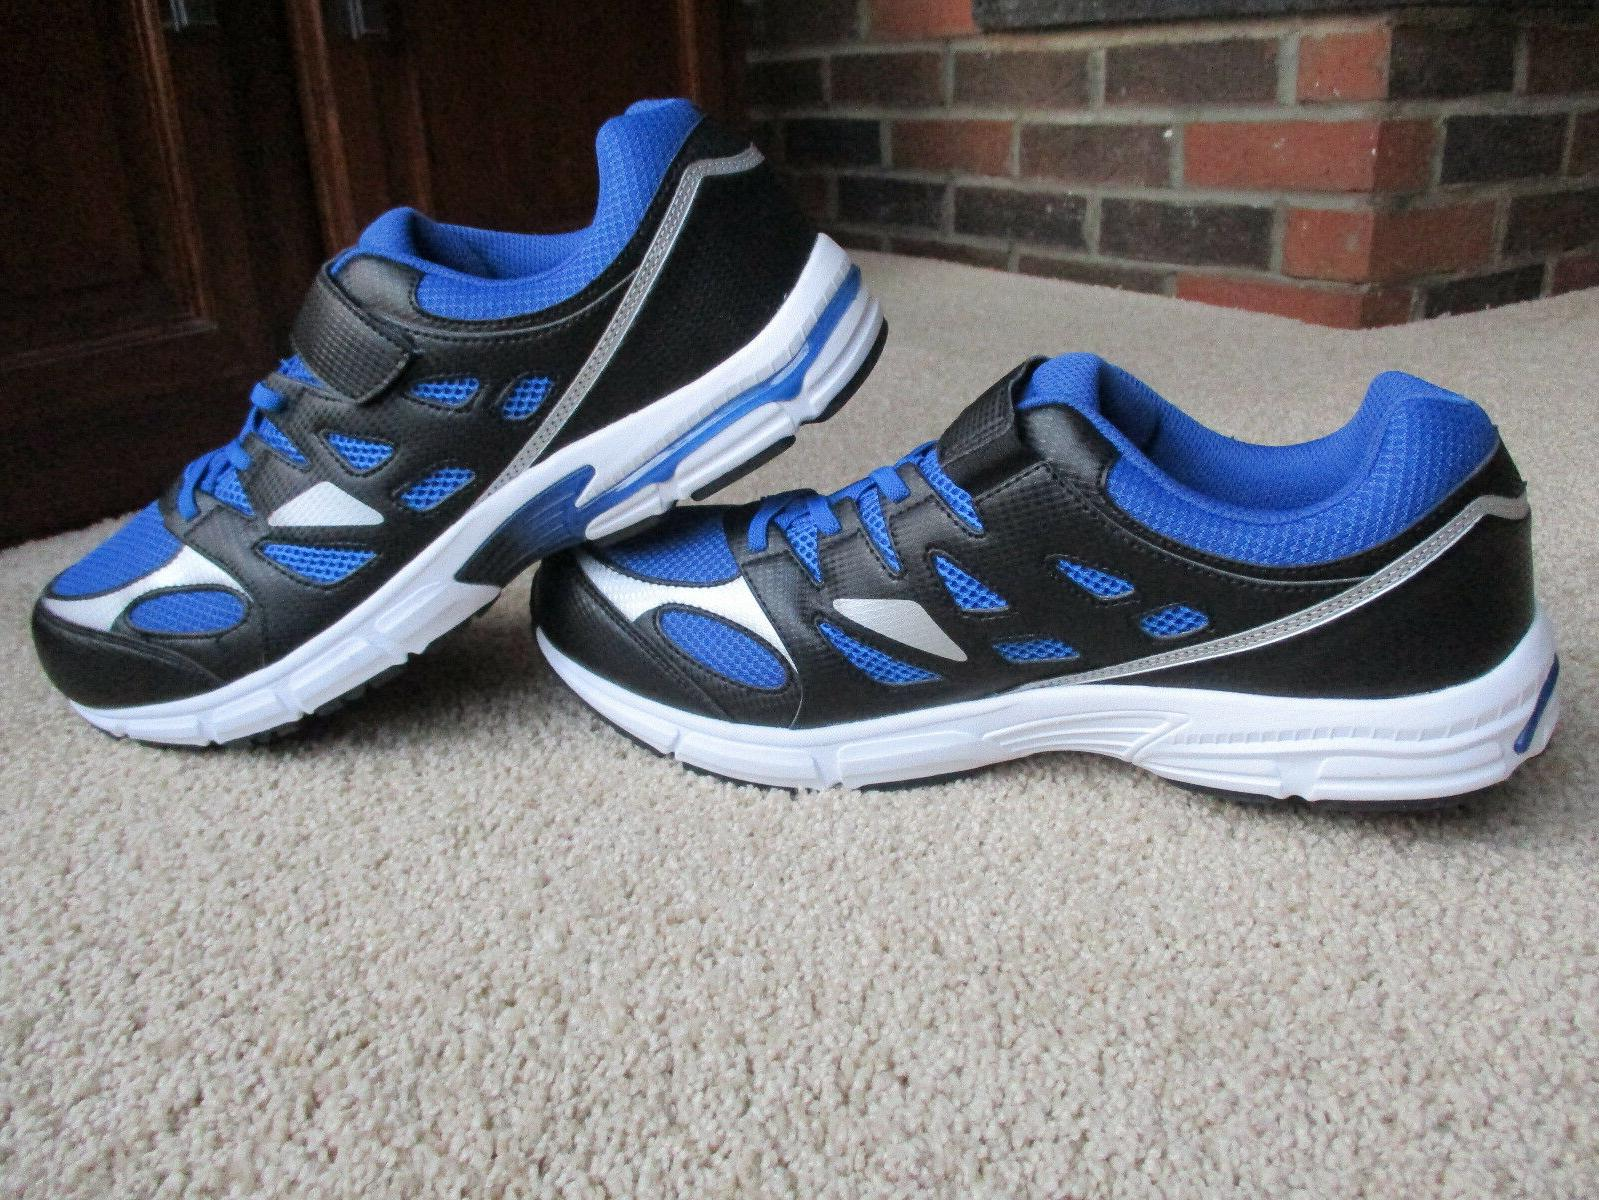 brand new men s tennis shoes size